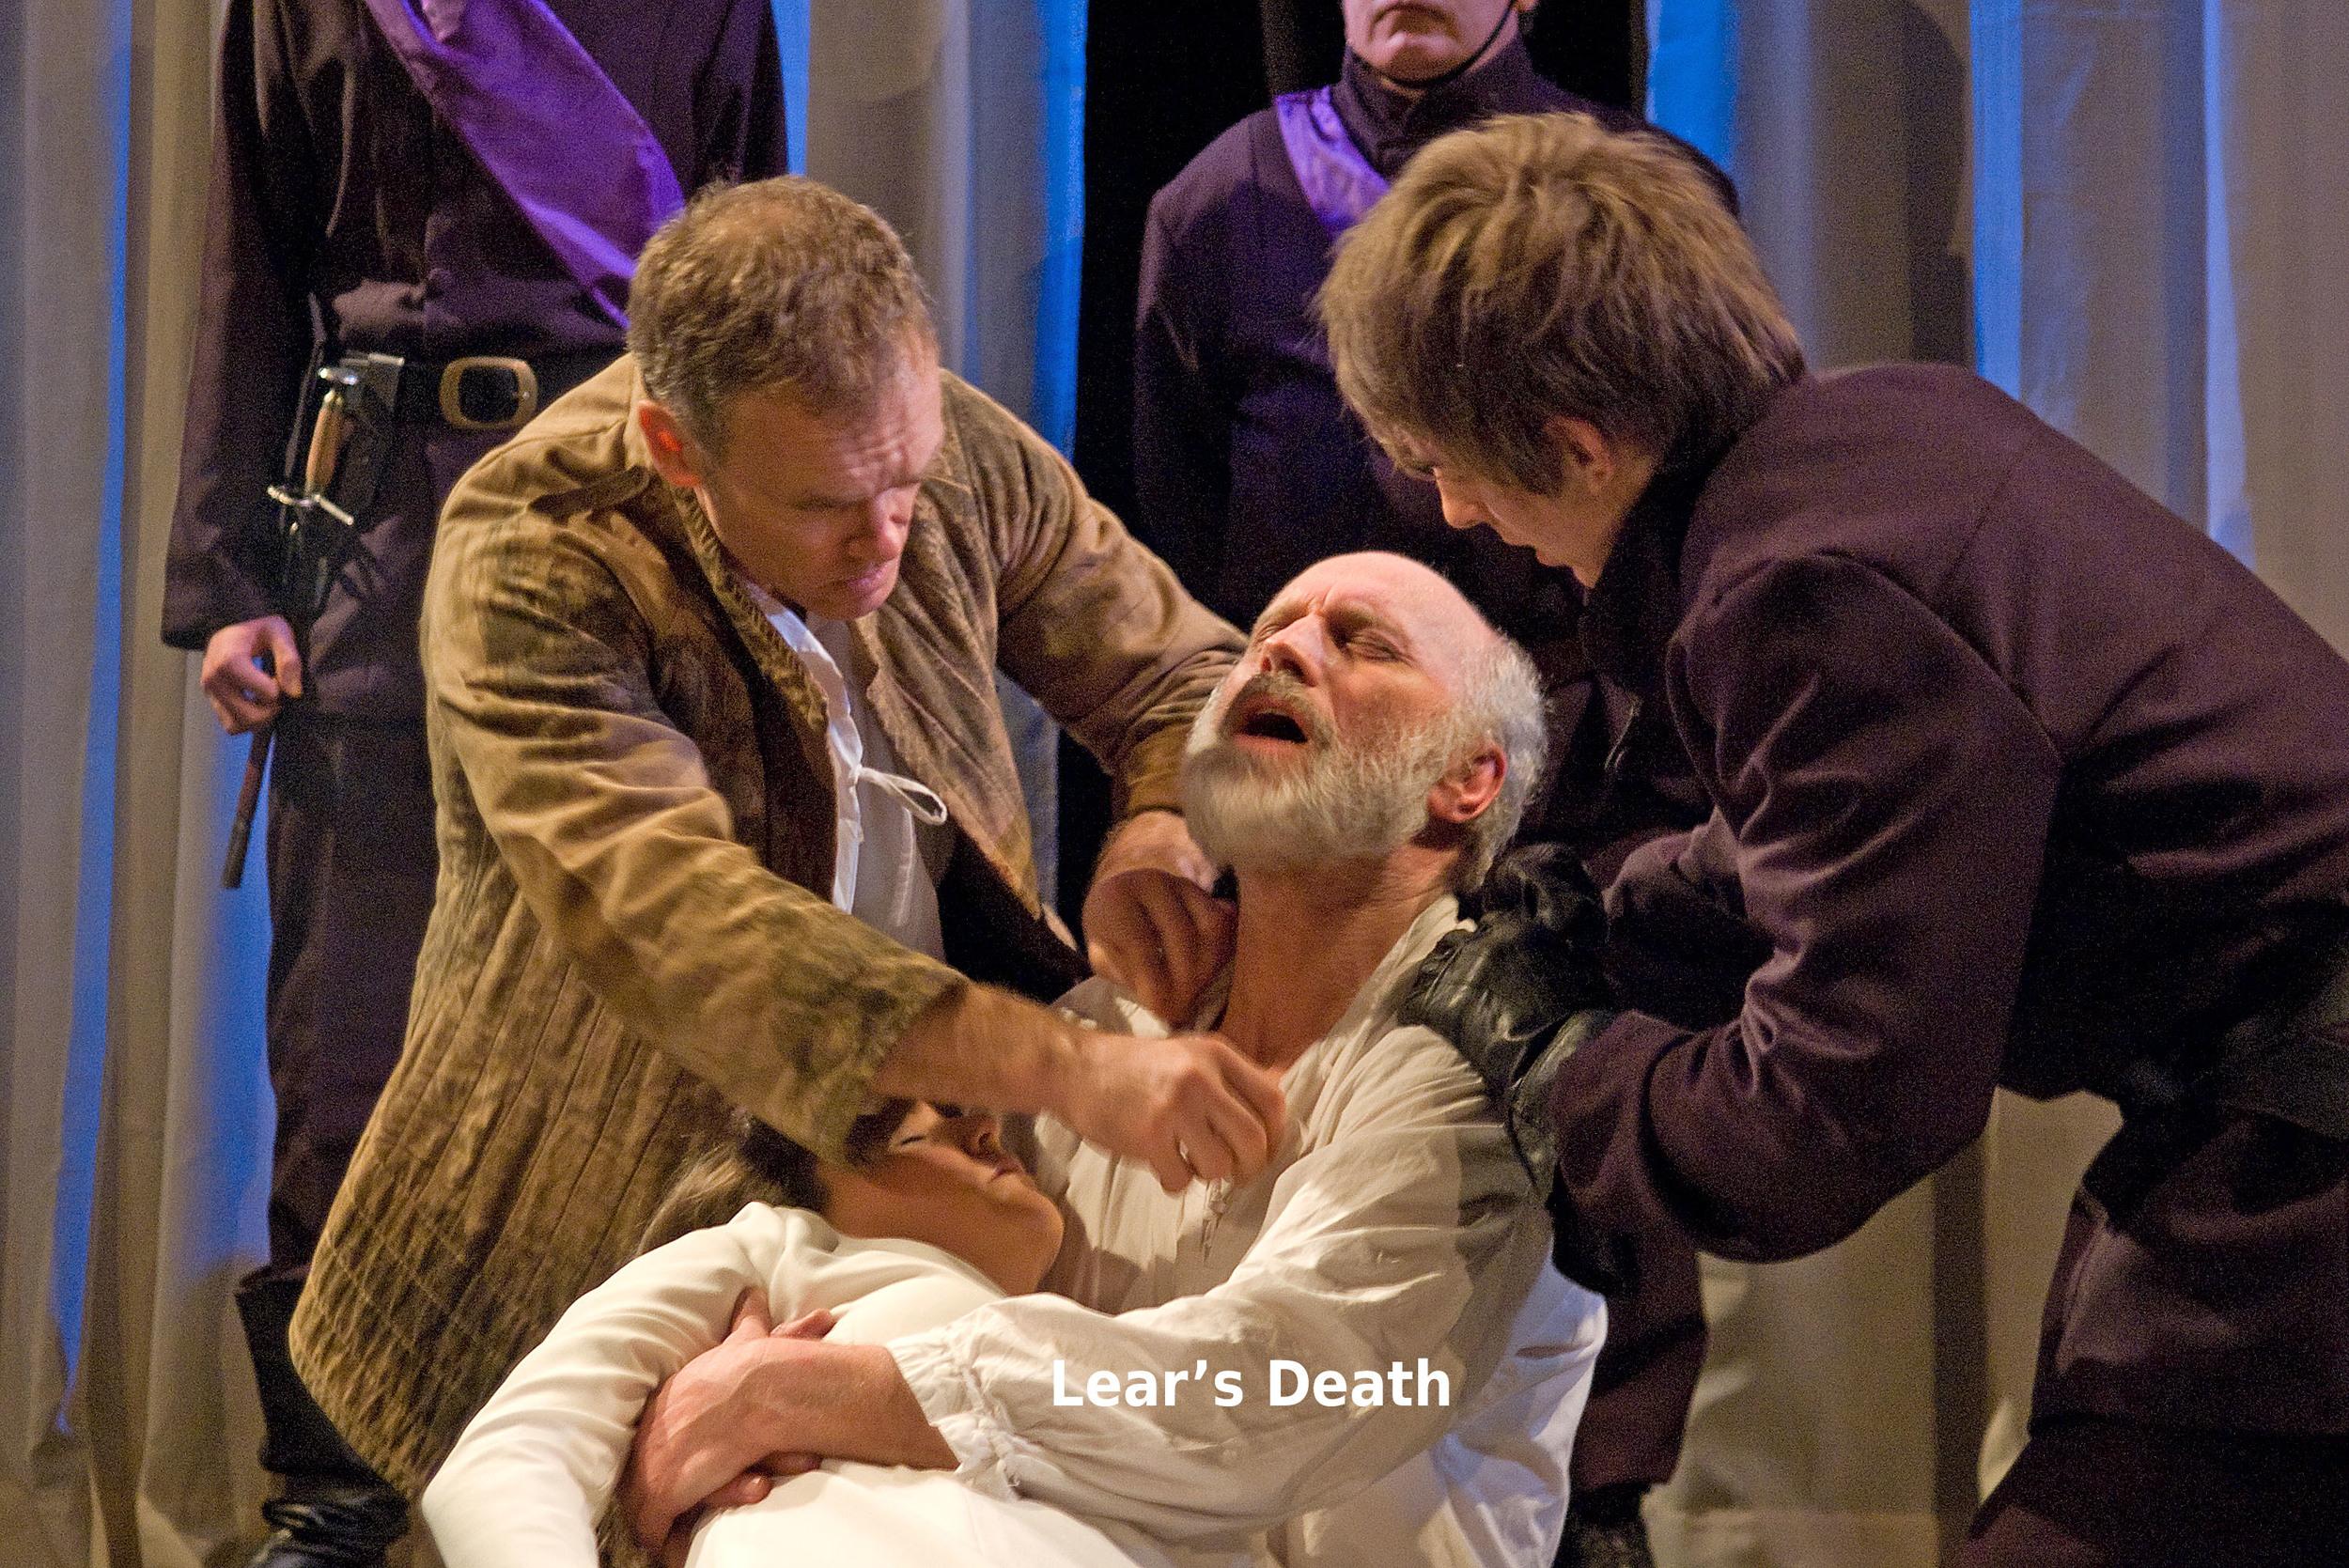 Lear's death.jpg